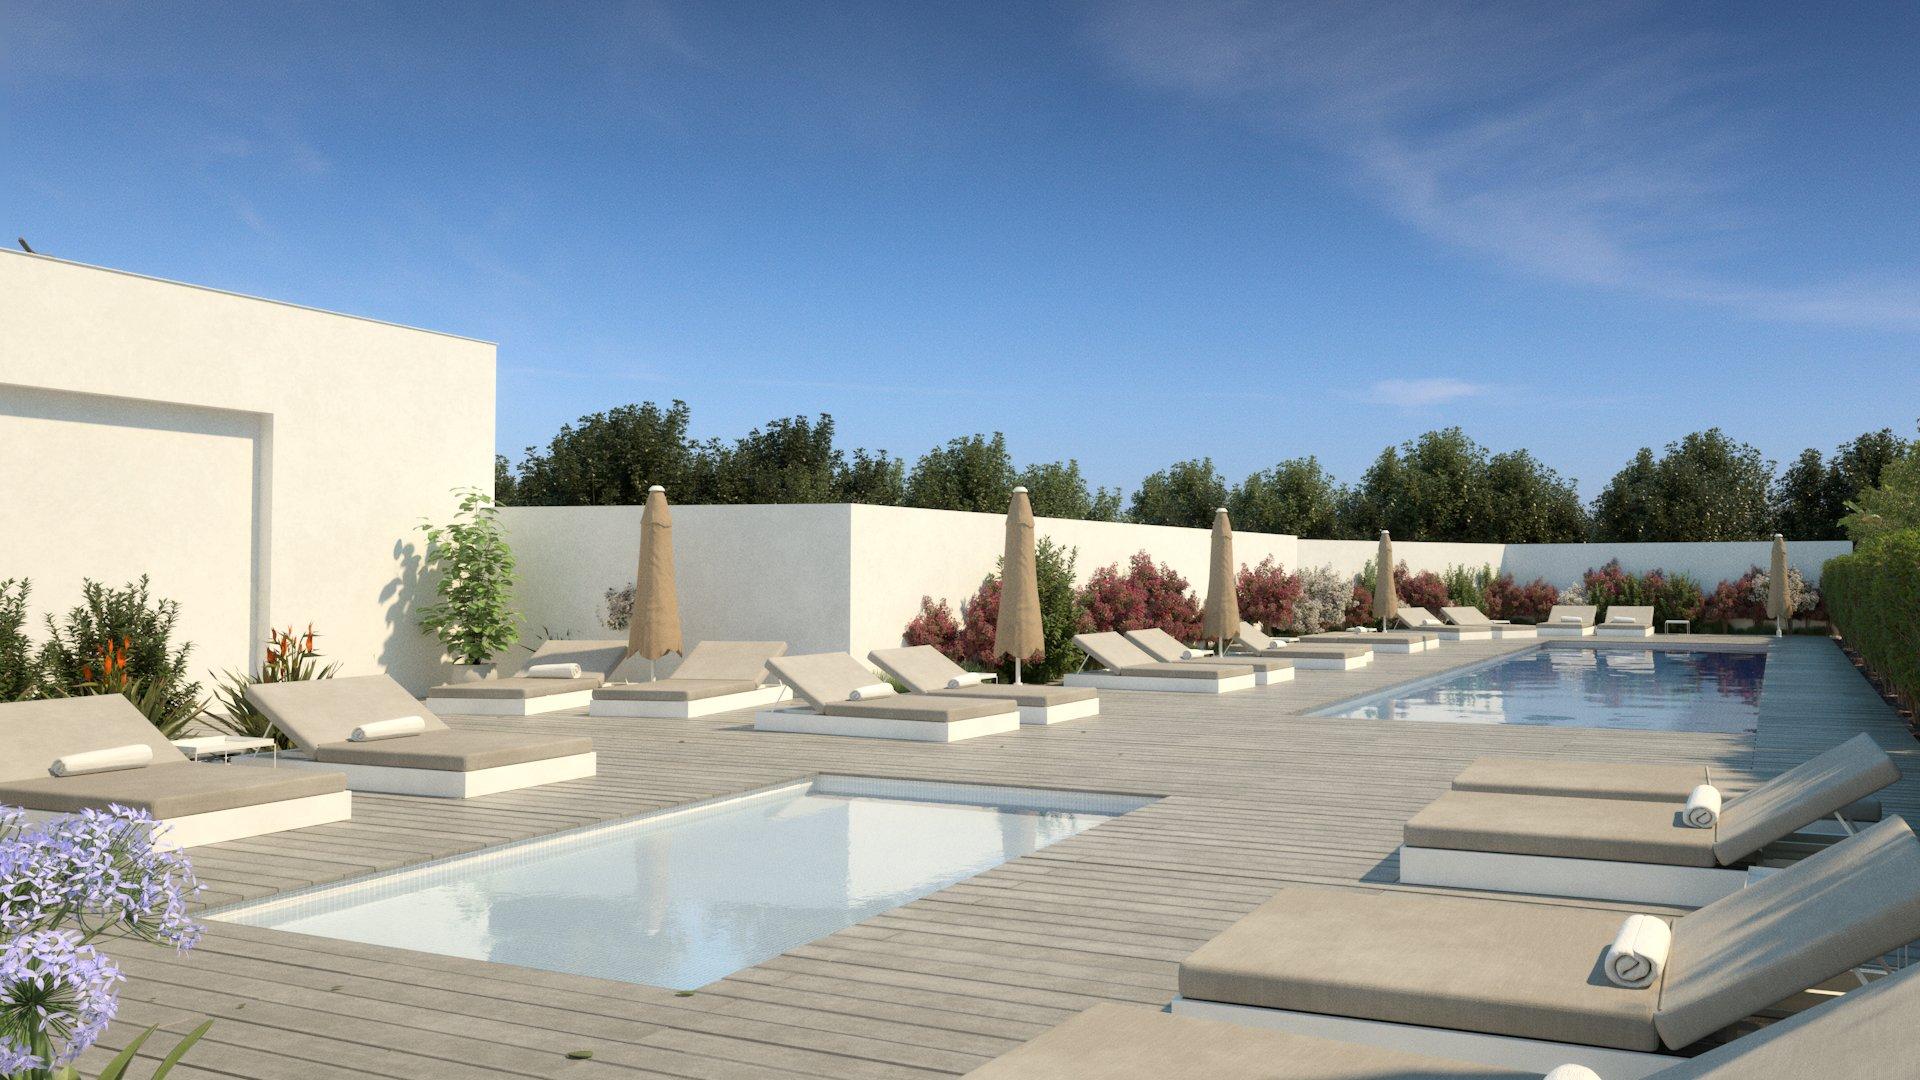 2 Bedroom Apartment Lagos, Western Algarve Ref: GA409I